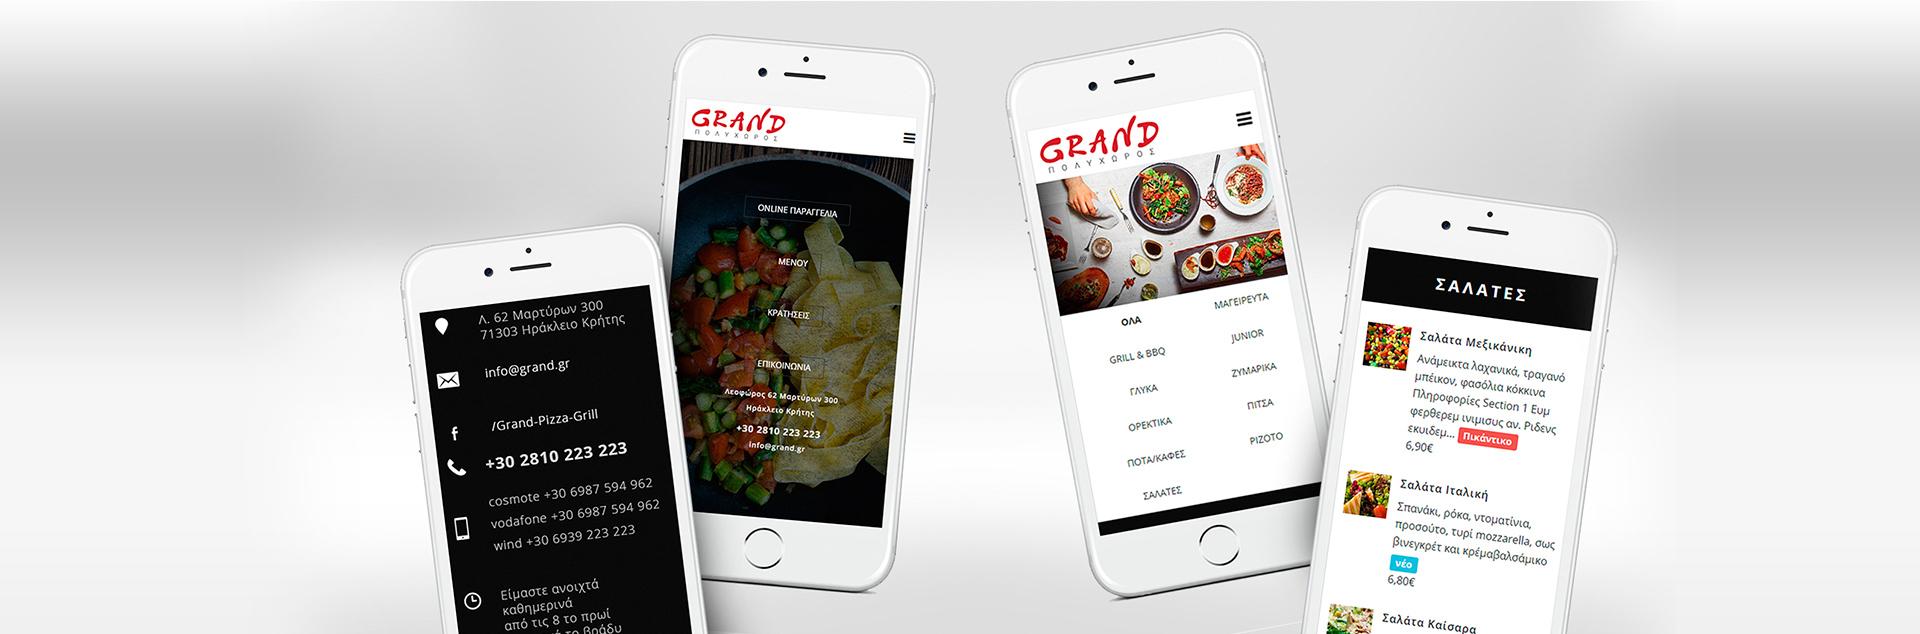 Grand responsive design